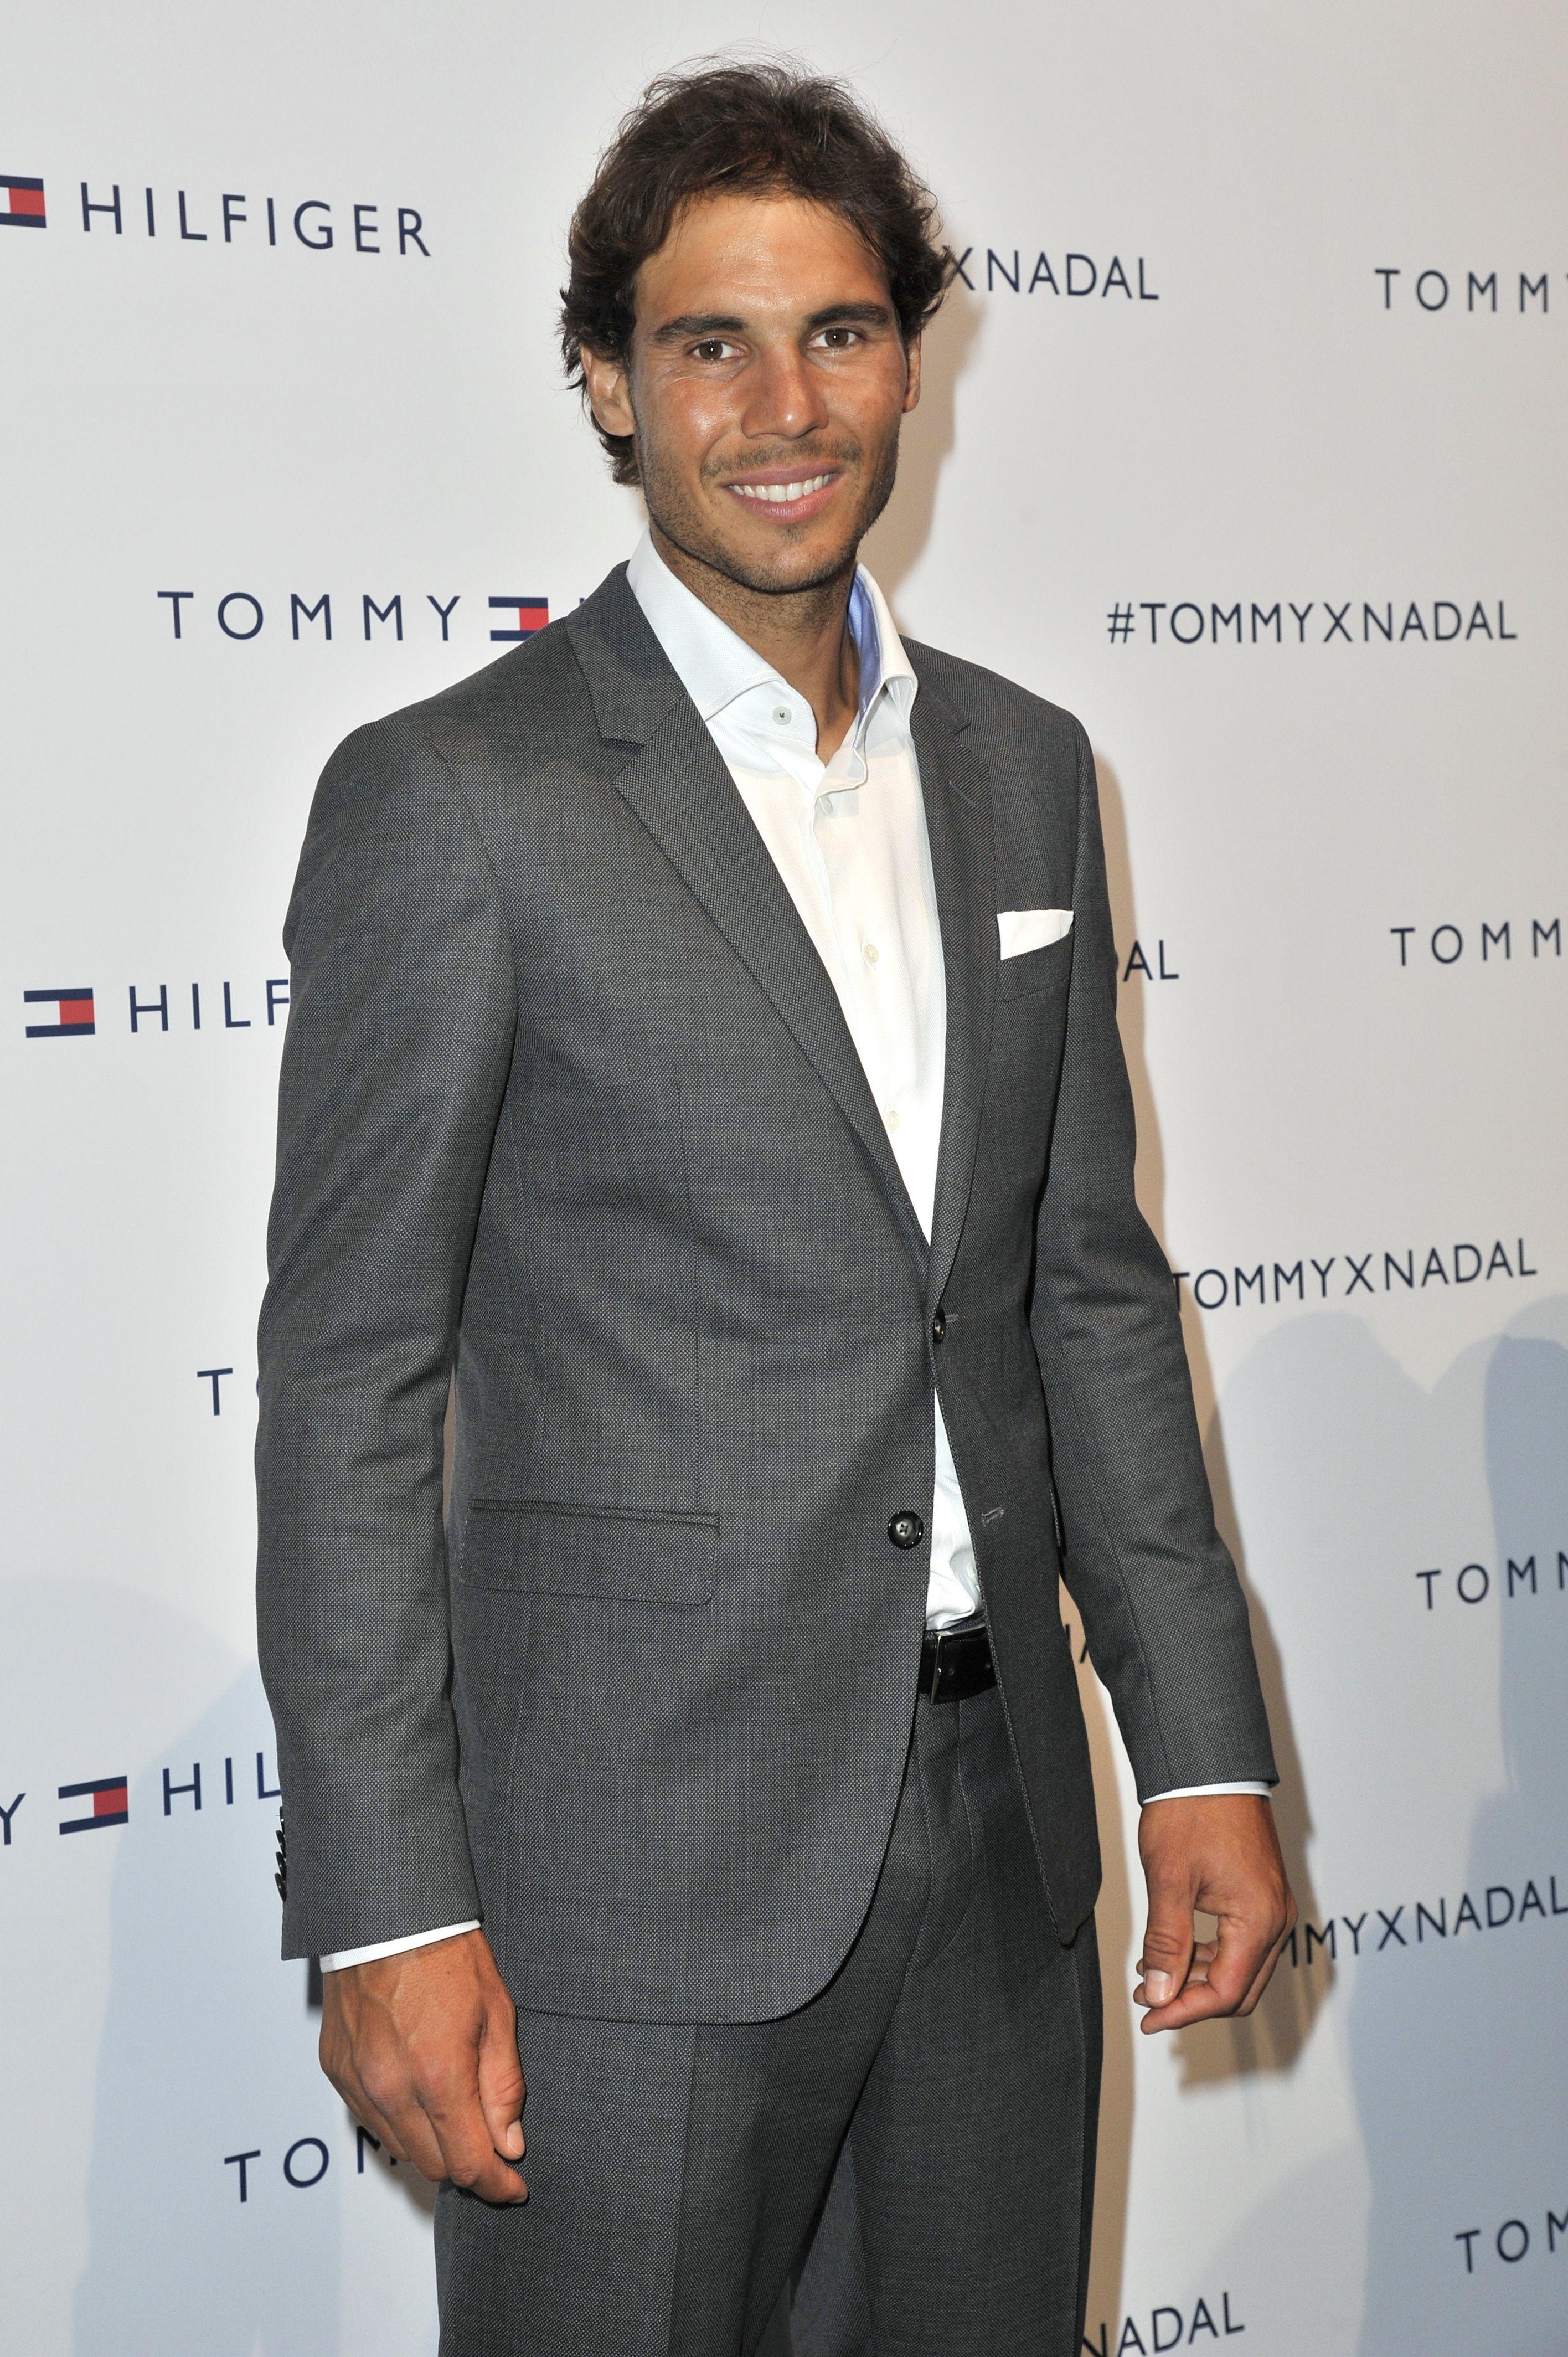 Rafael Nadal: $120 million